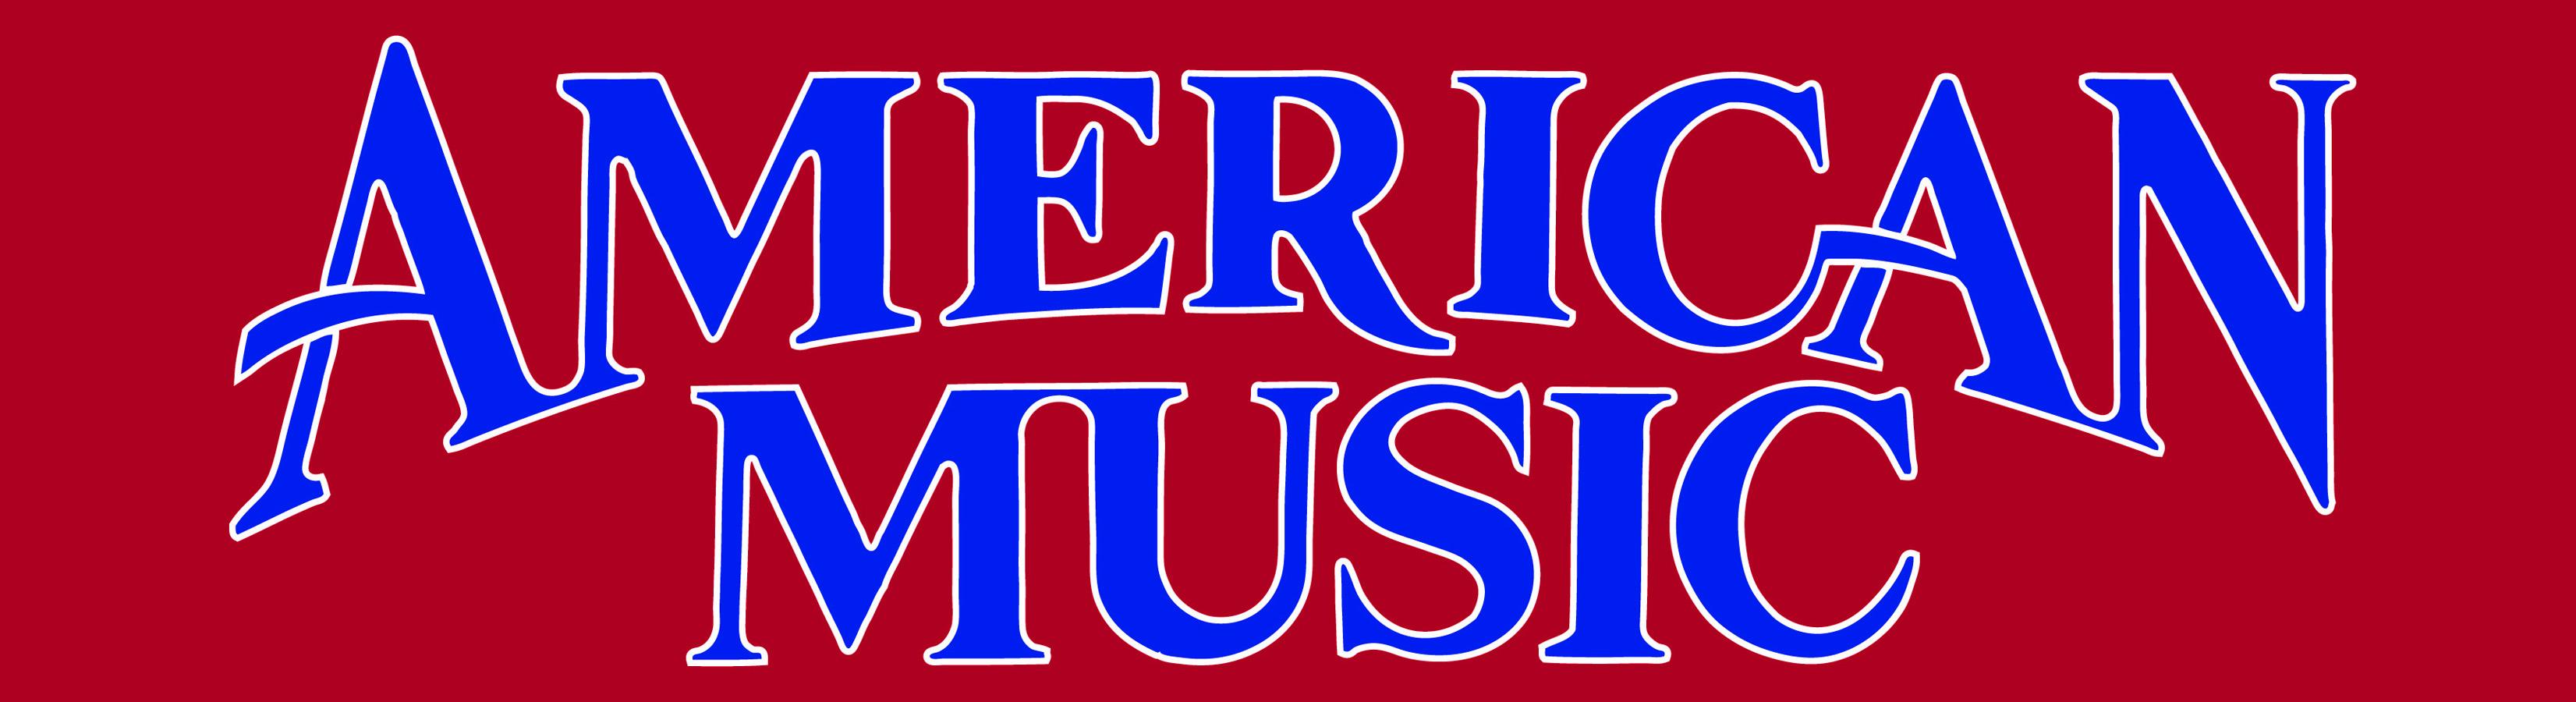 AmericanMusicLogo